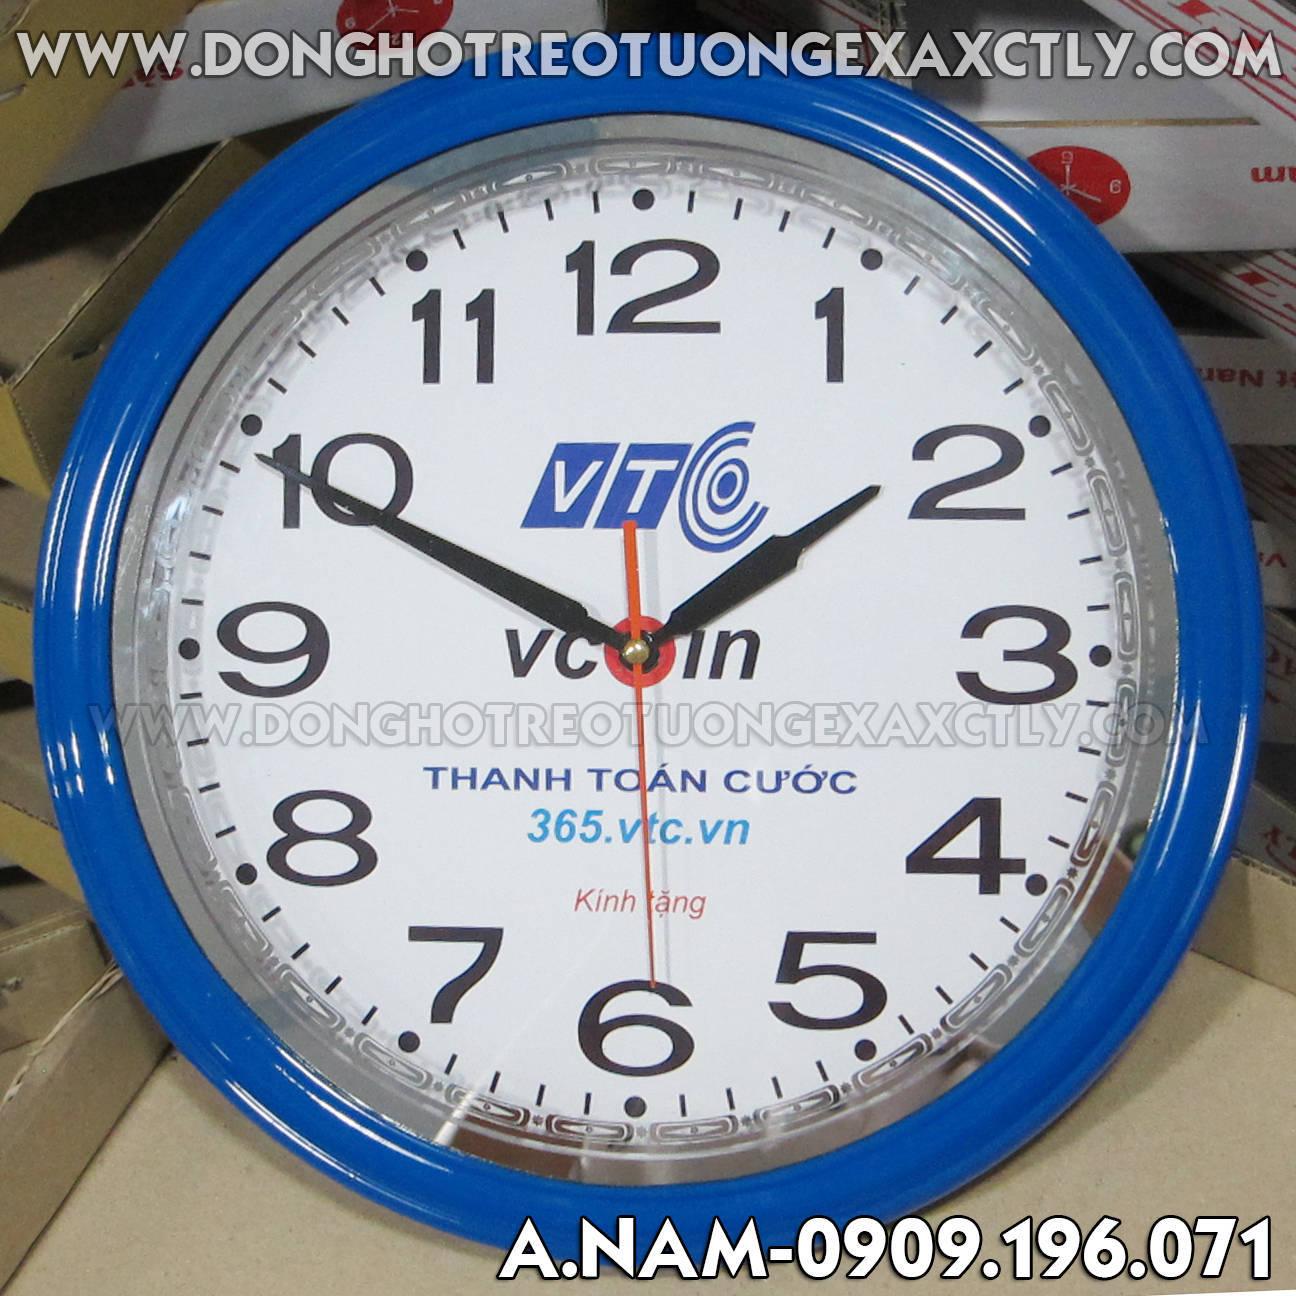 đồng hồ treo tường VTC vcoin